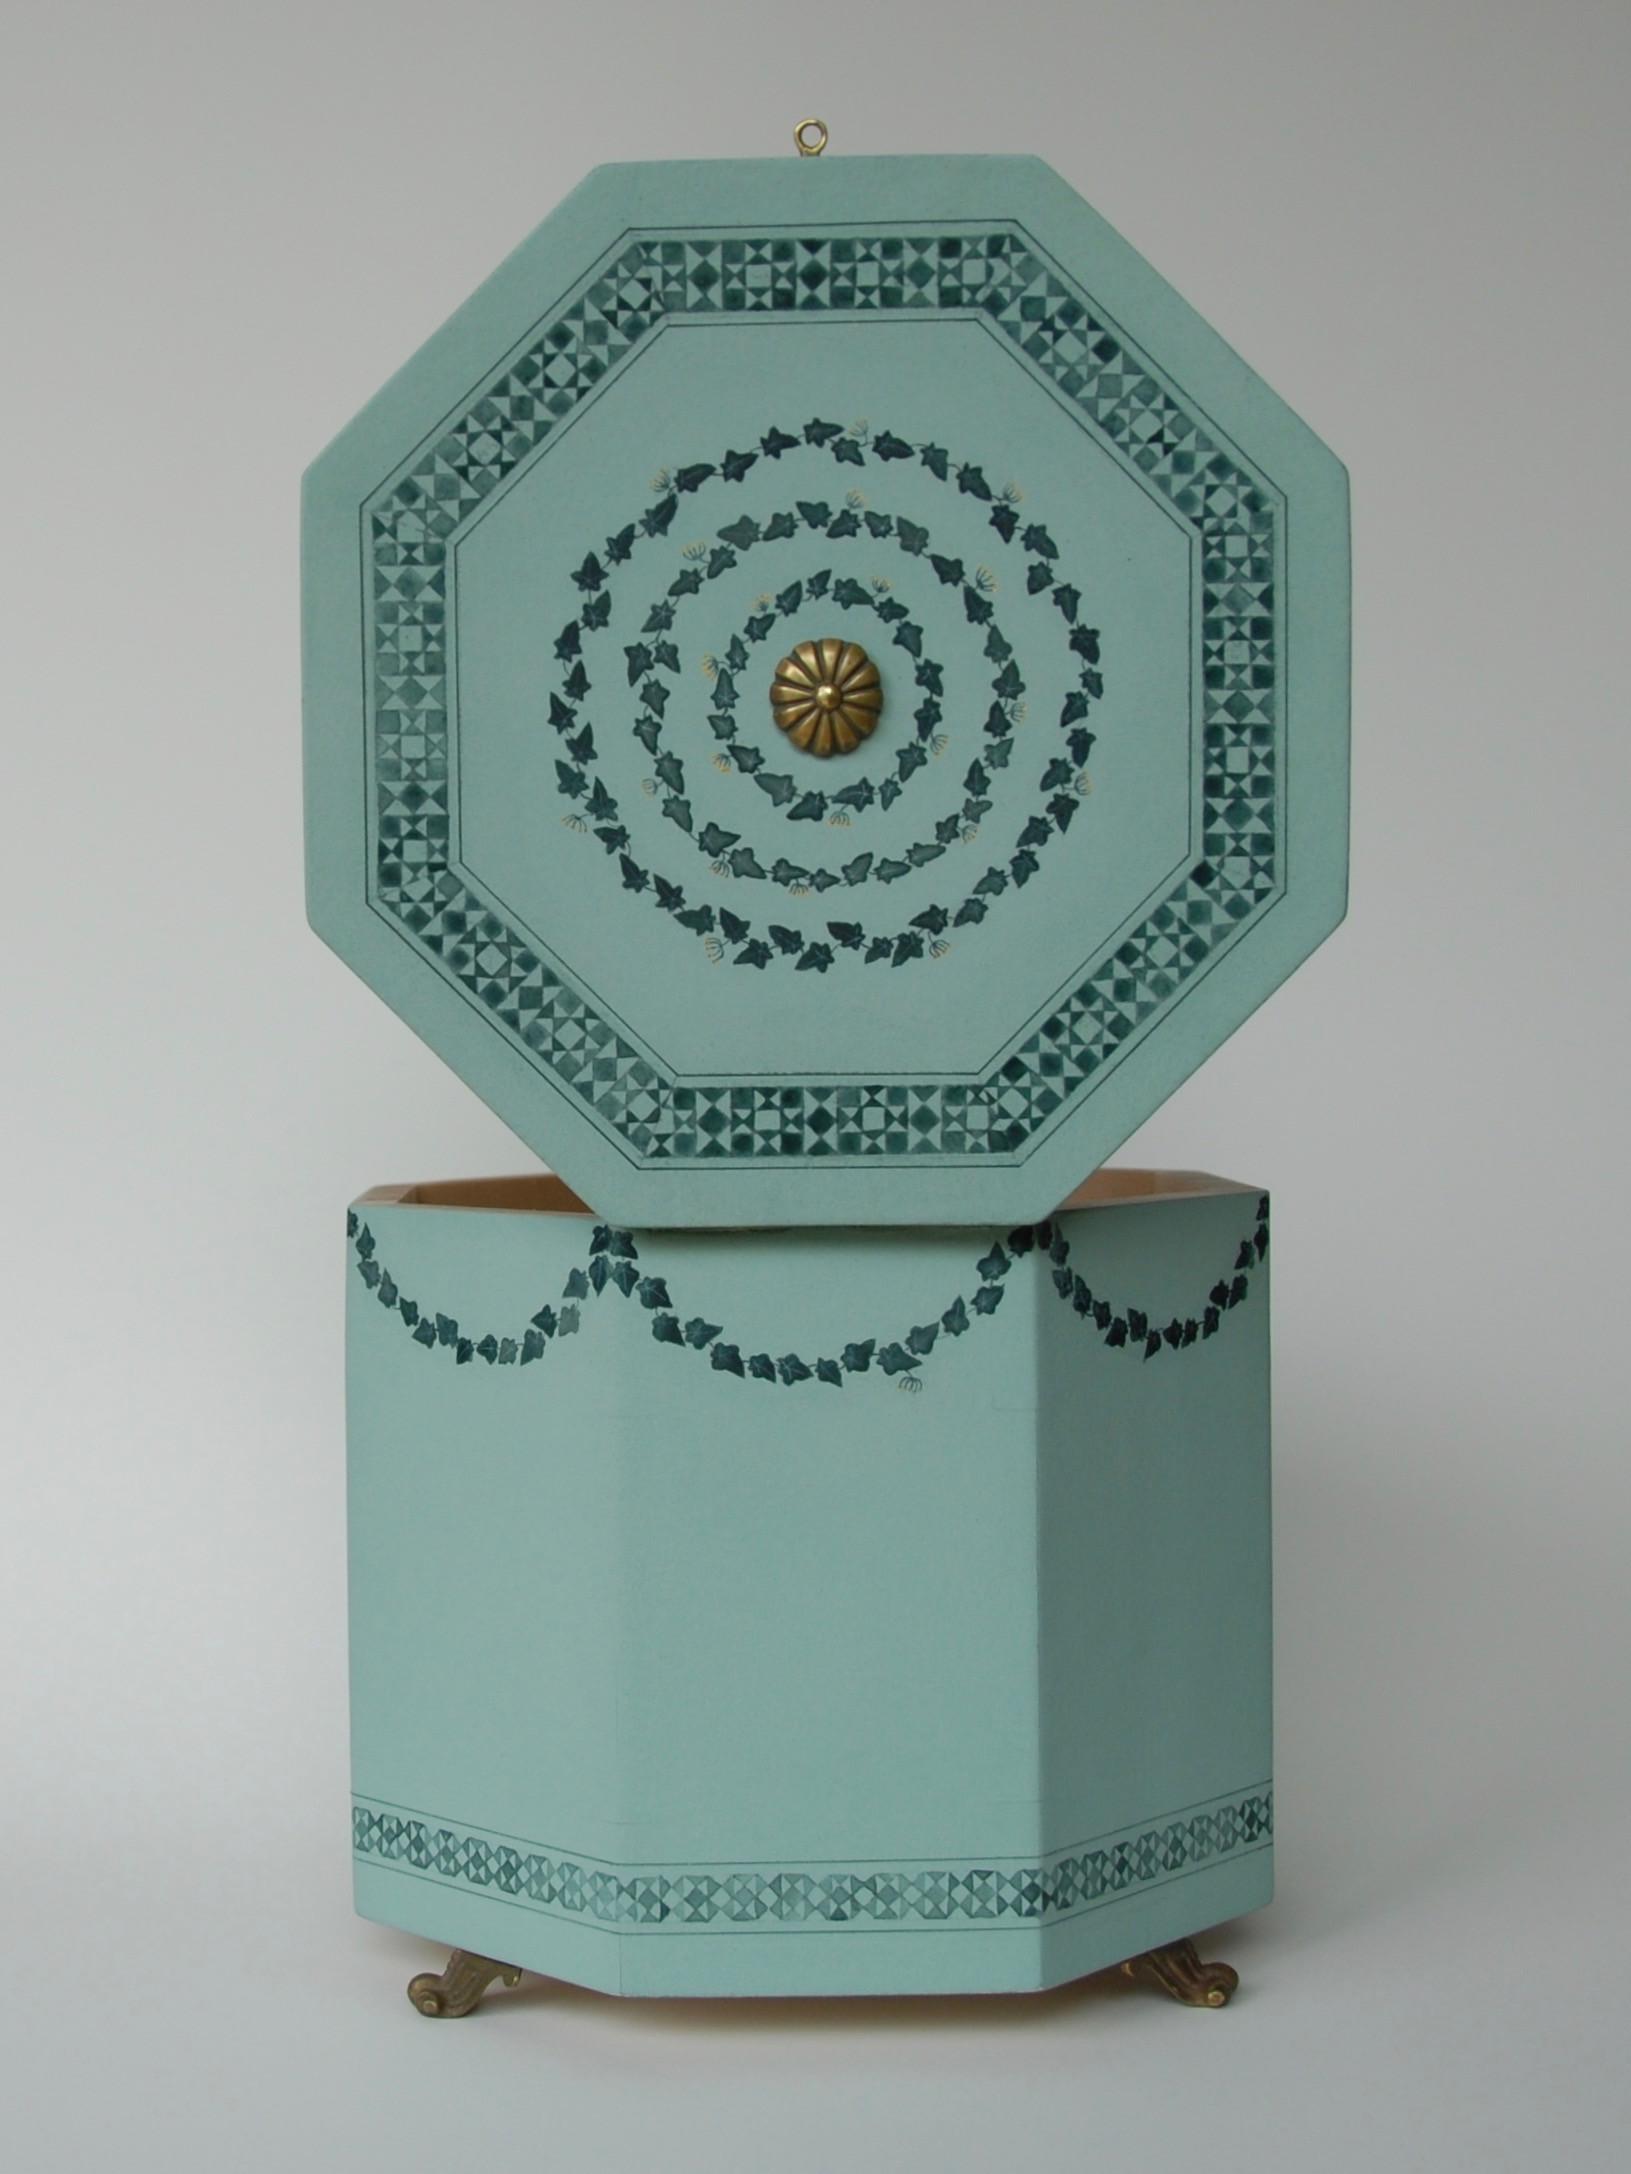 Funerary Box, Ganestam, Degree Show